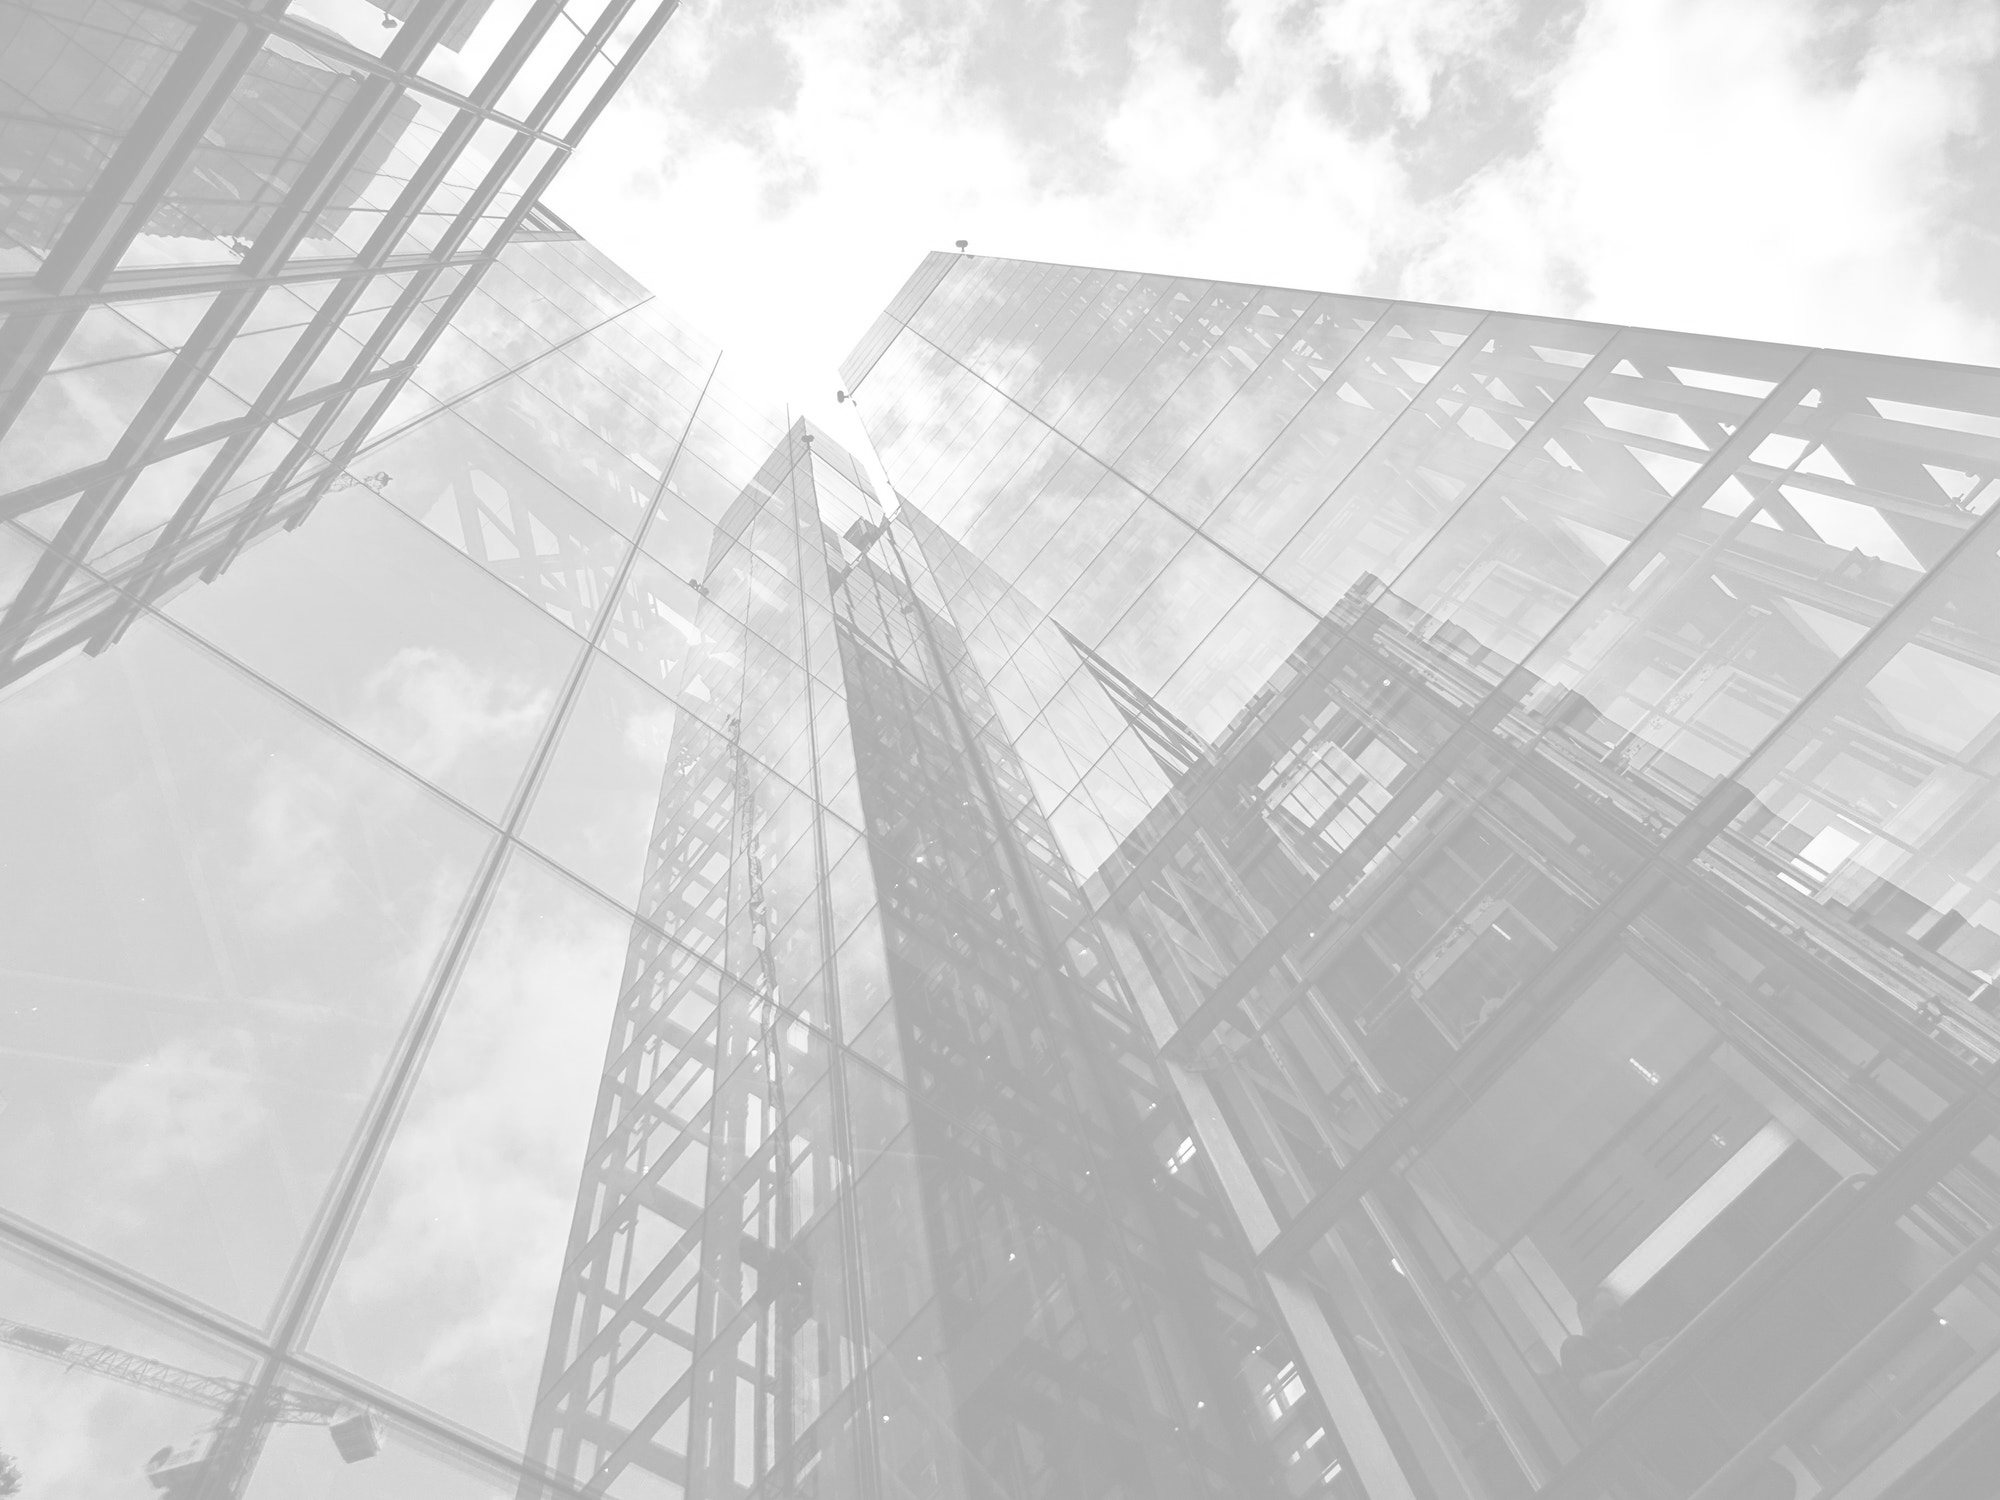 Big city perspective - black & white